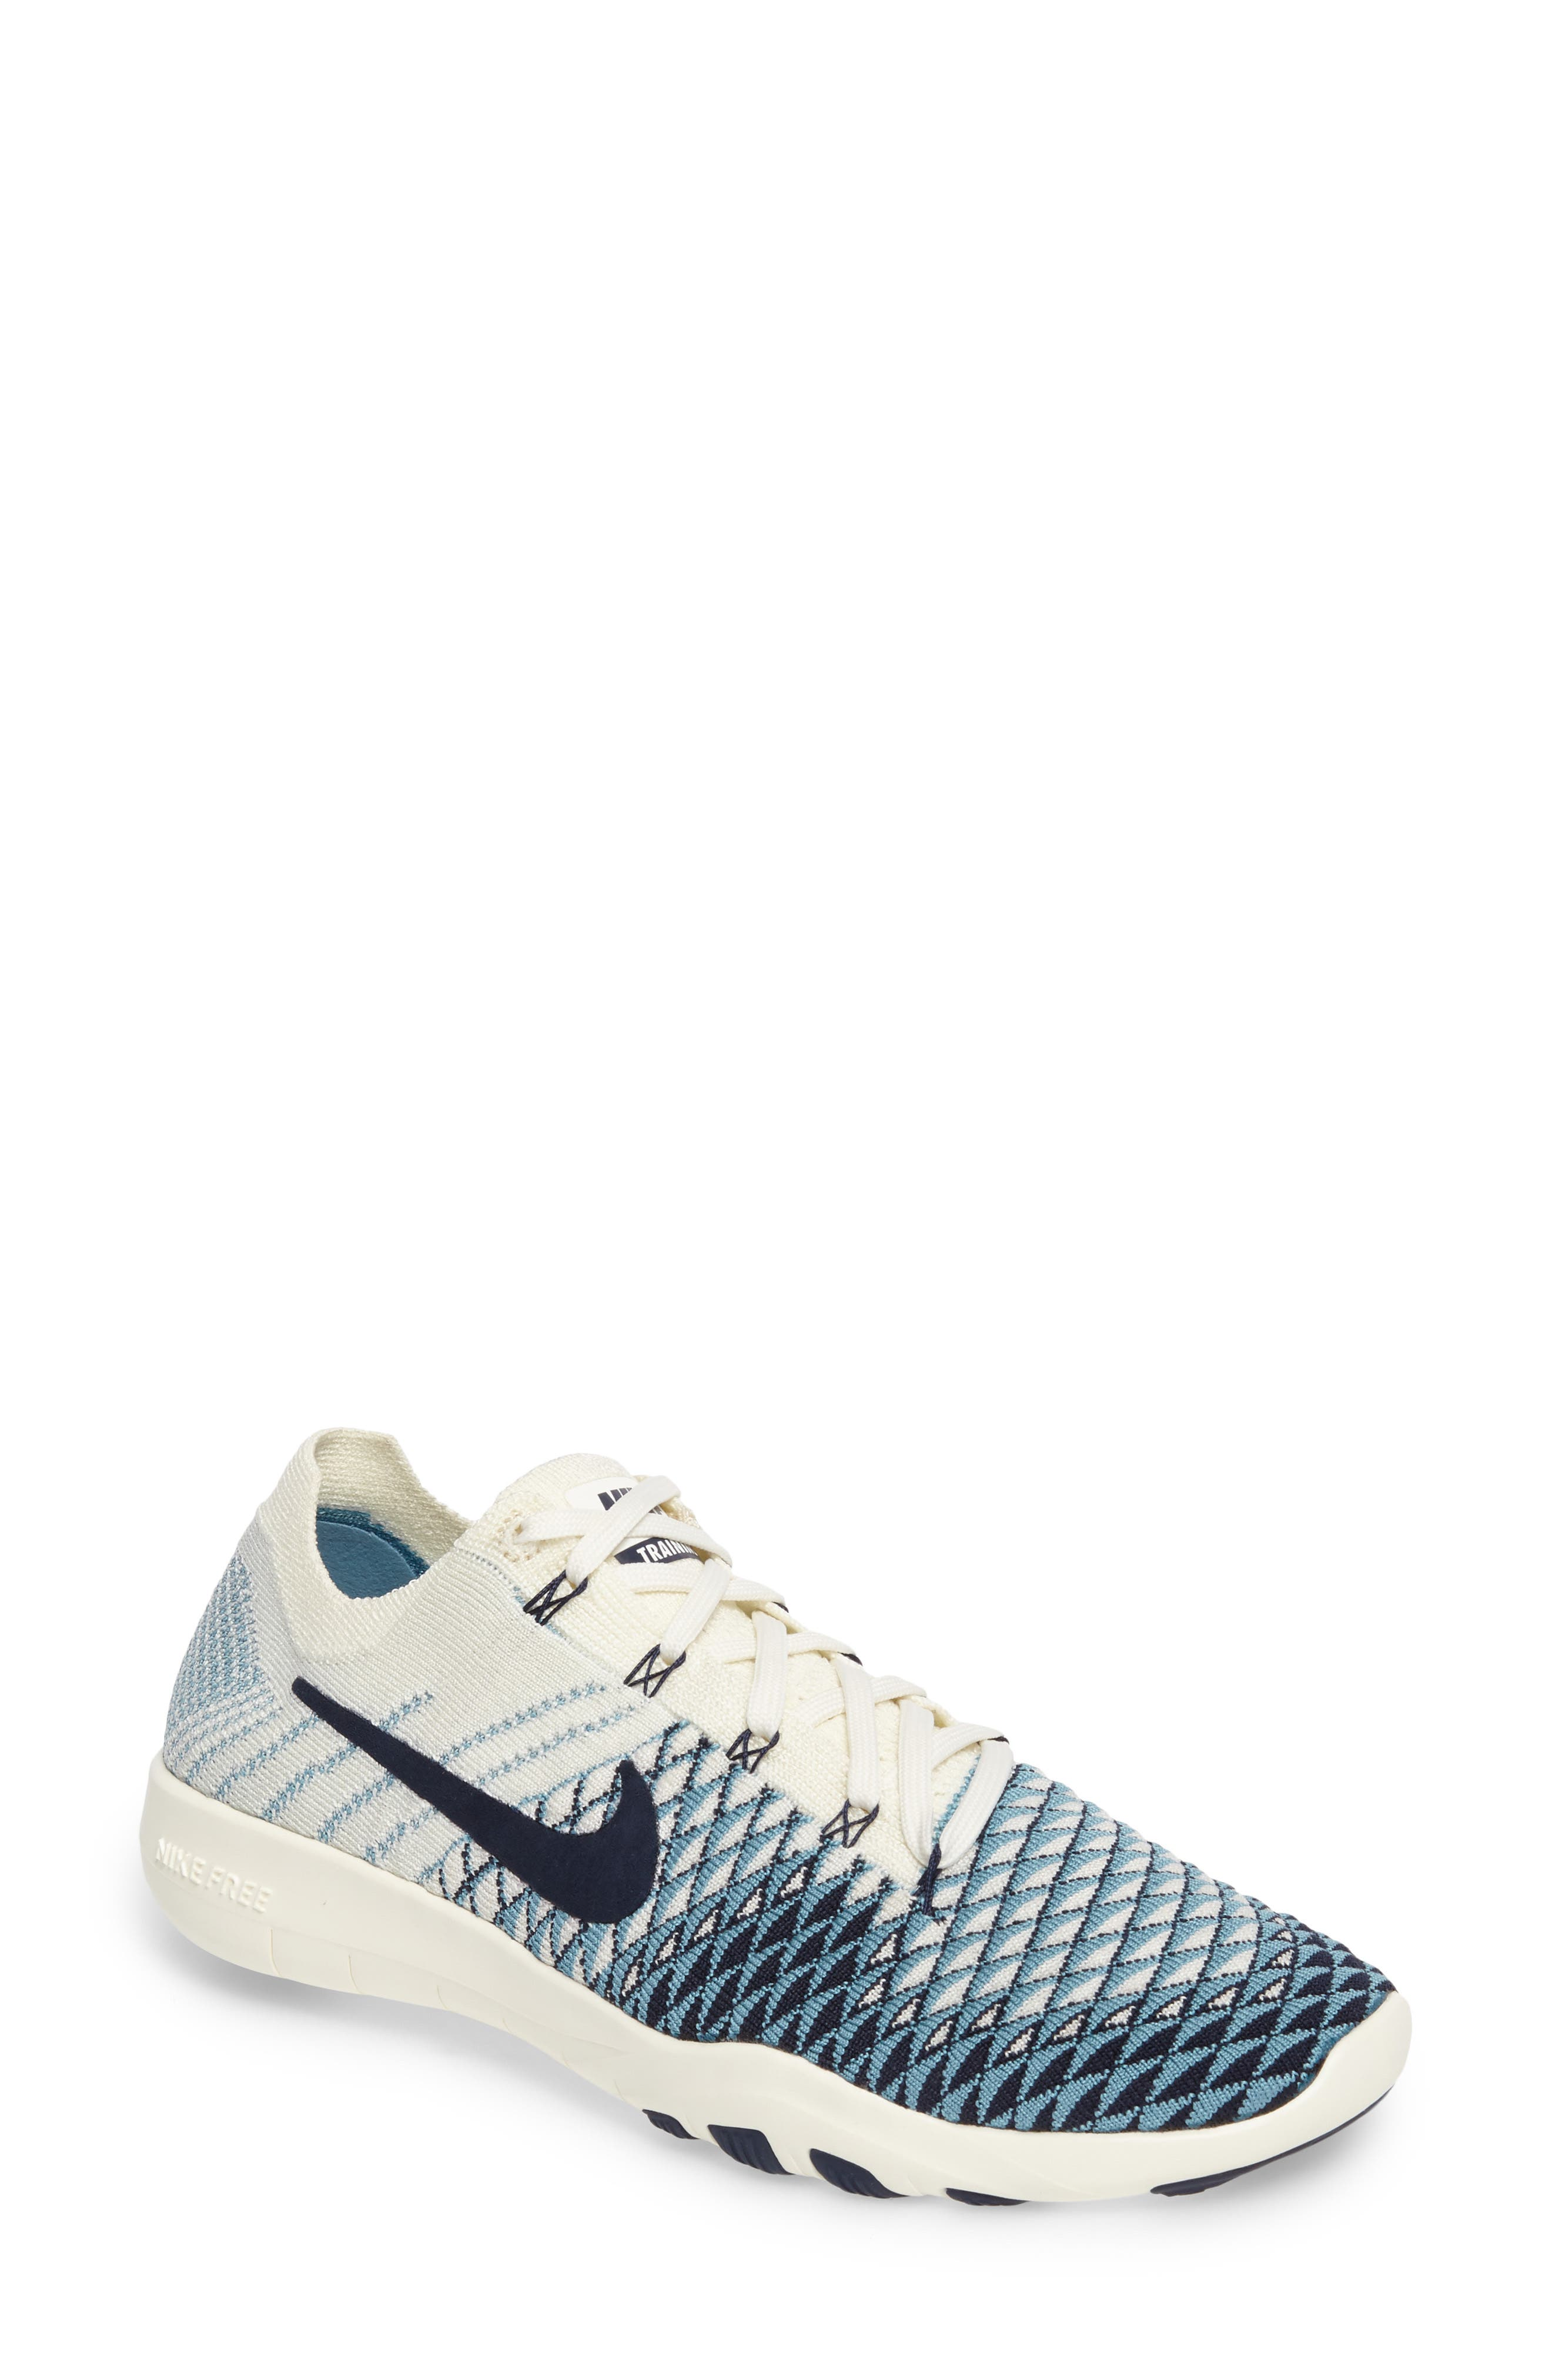 Main Image - Nike Free TR Flyknit 2 Training Shoe (Women)